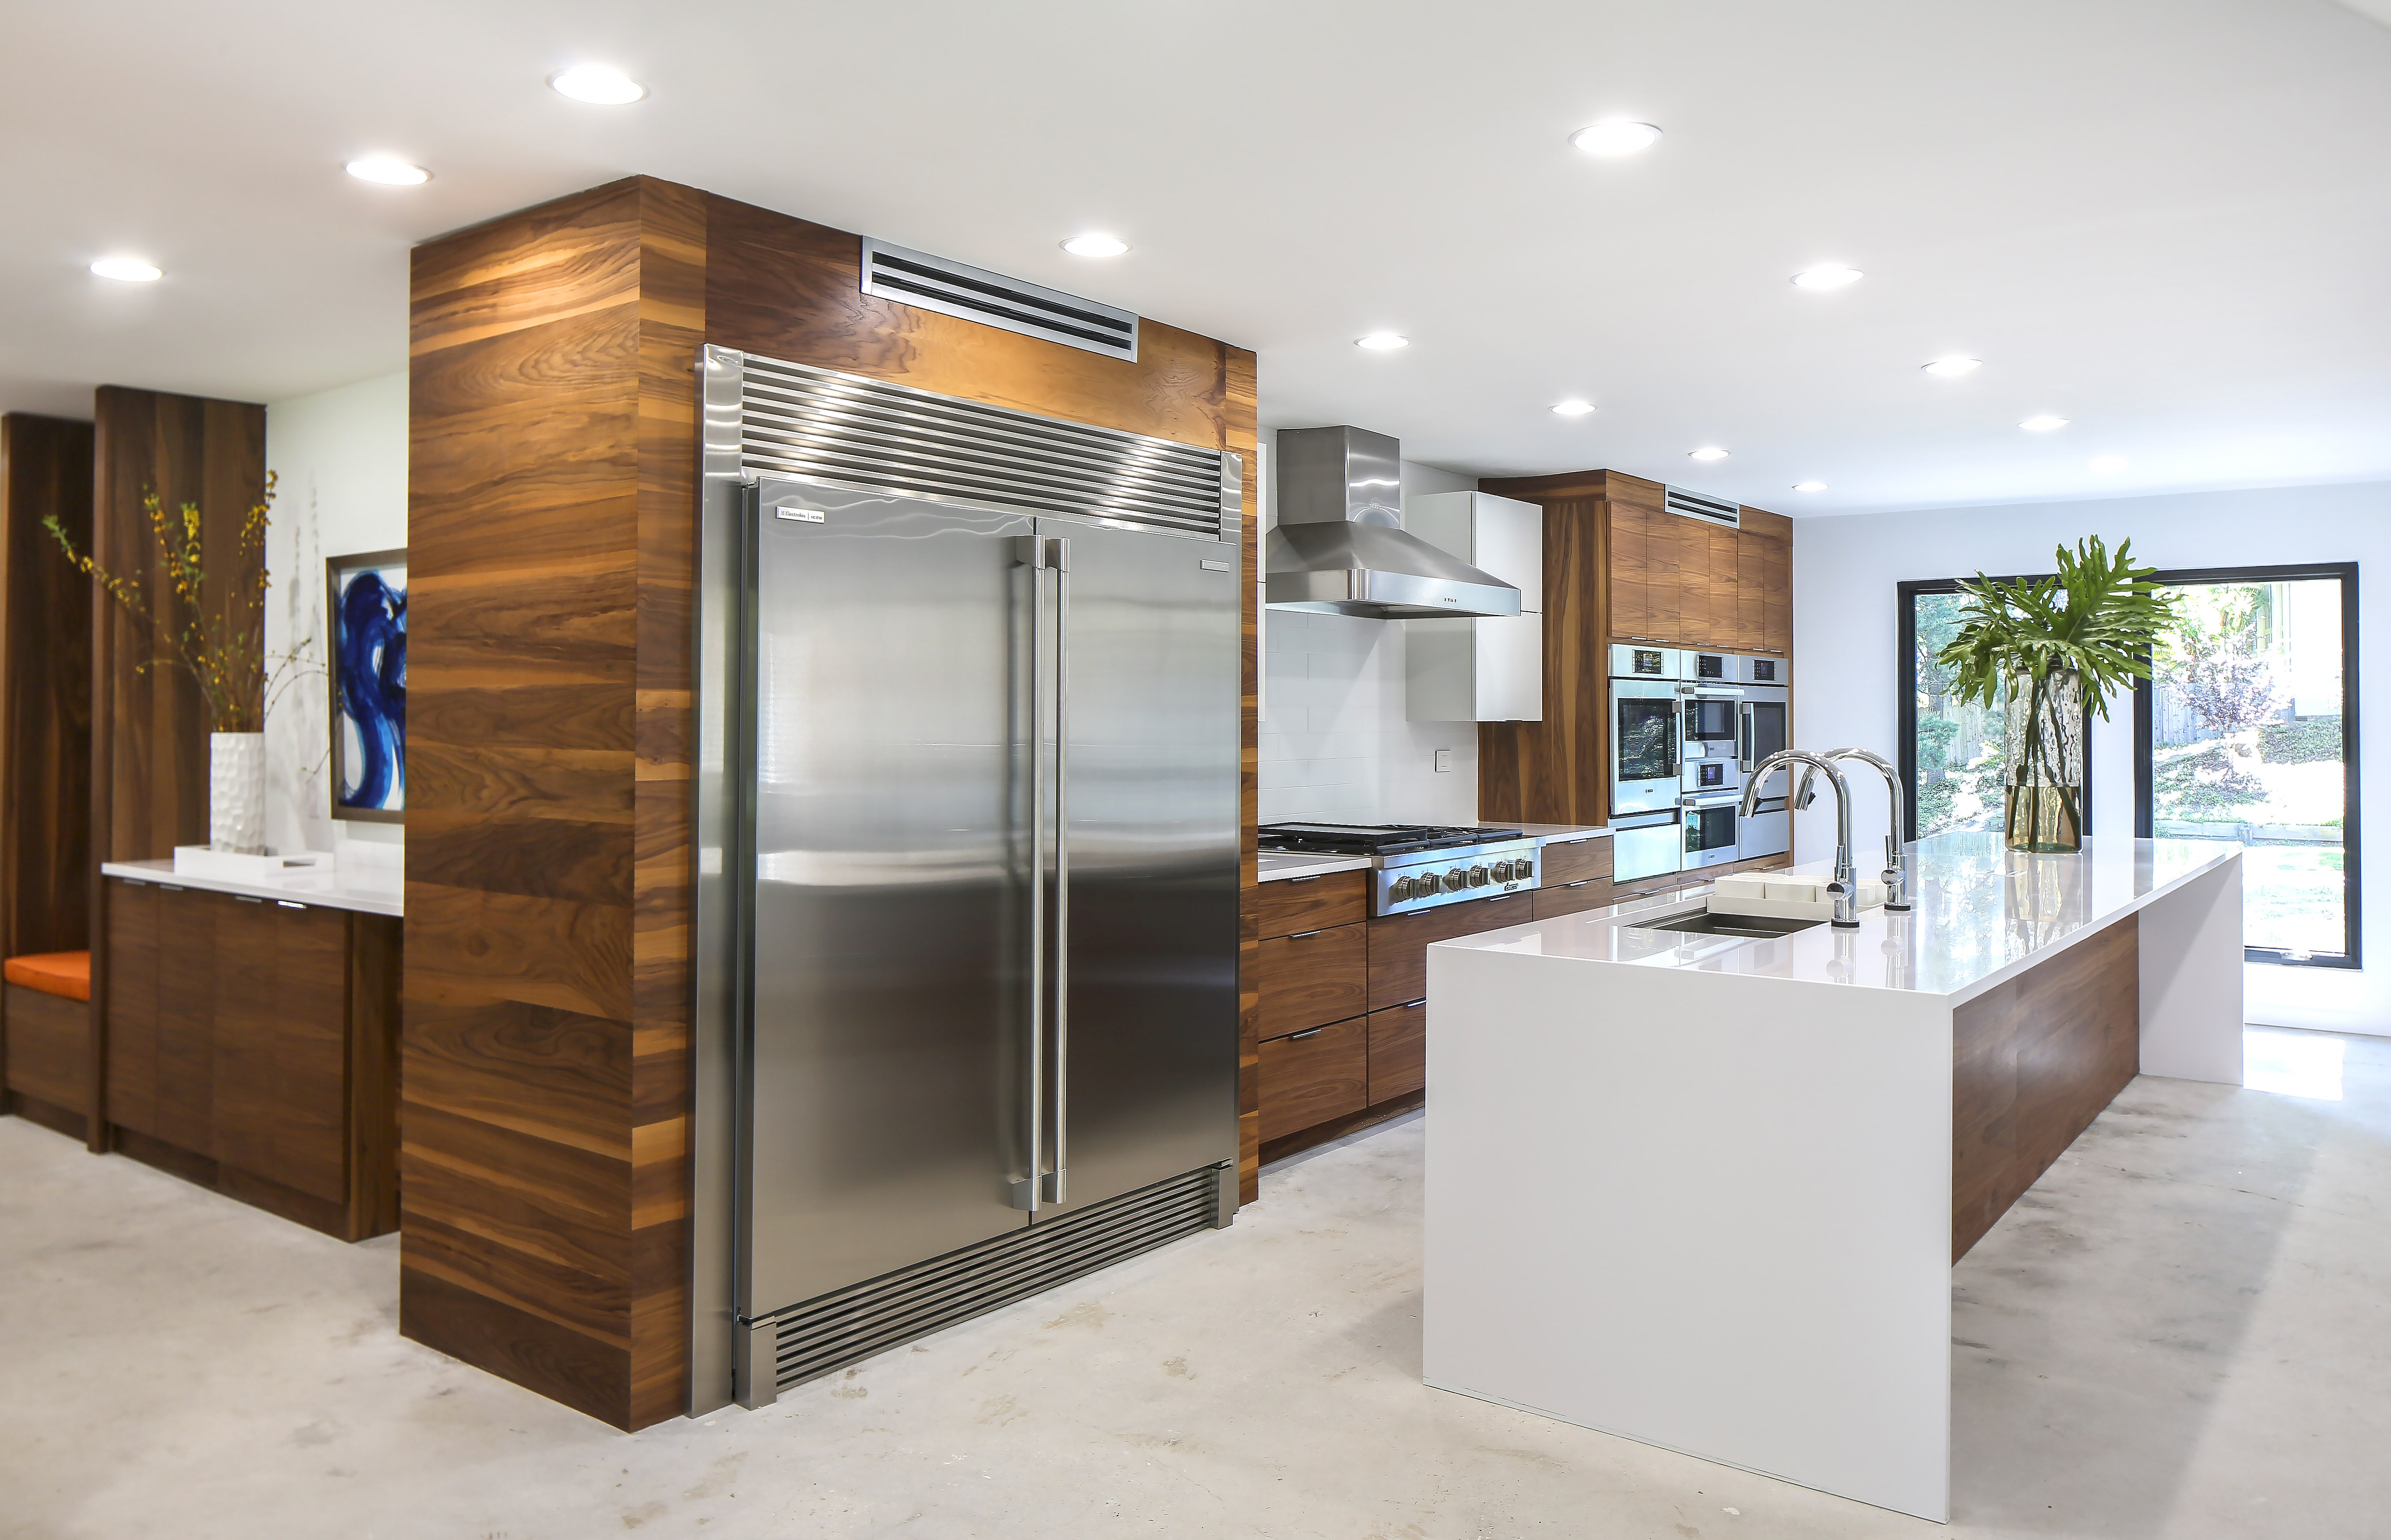 Designer Tip Angela Poirrier On Modernizing Dated Spaces